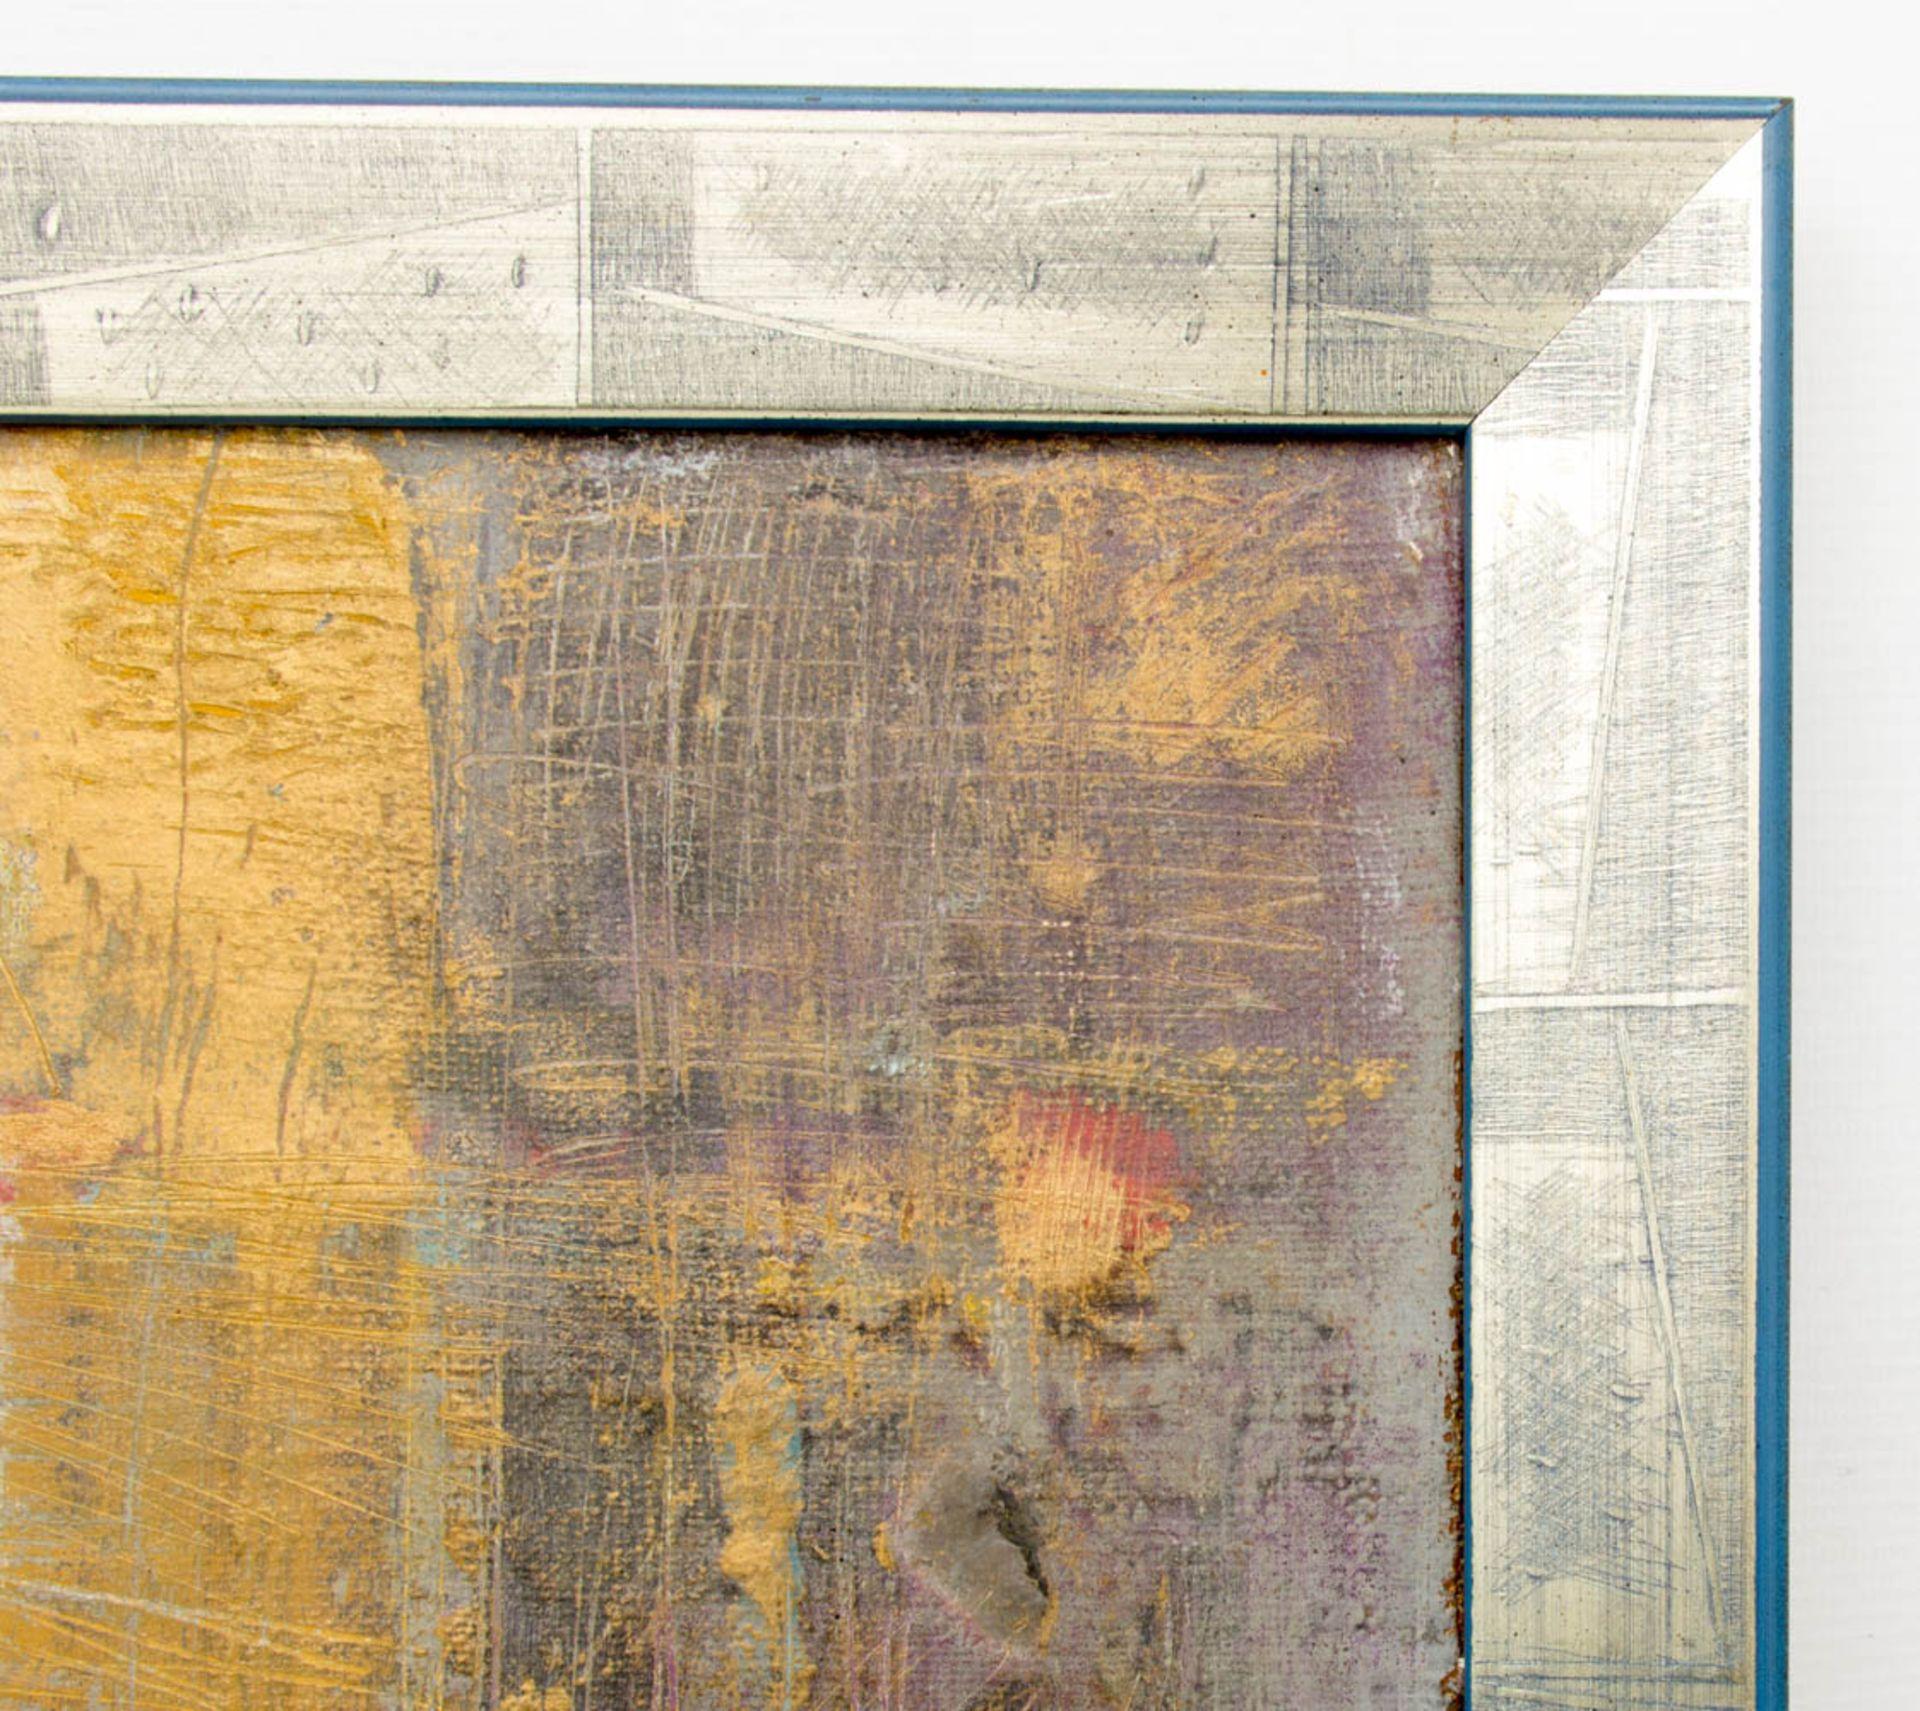 Abstrakte Komposition, Enkaustik auf Leinwand.Signiert unten rechts, gerahmt.Rück - Bild 3 aus 4